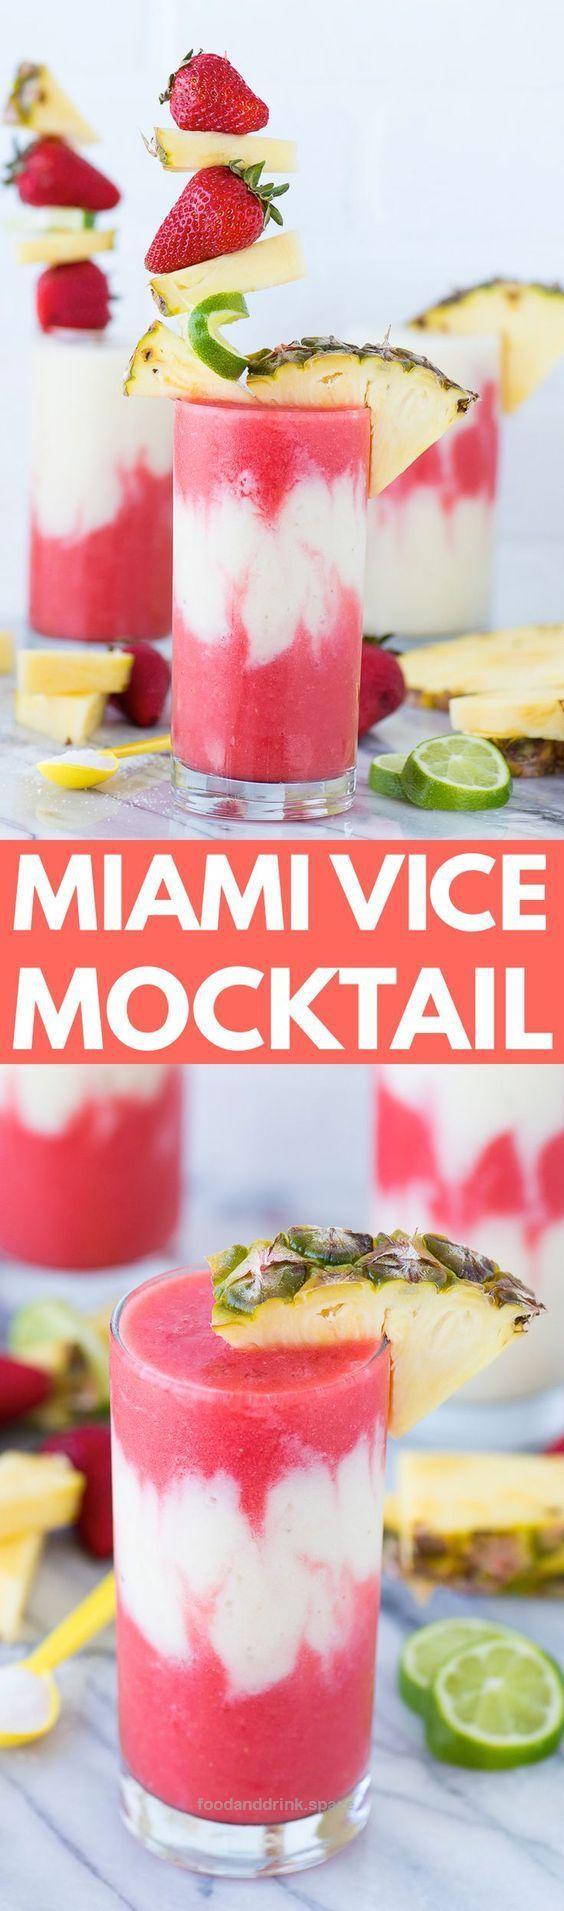 Tropical Miami Vice Mocktail Non-Alcoholic Frozen Drink Recipe via The First Yea… Tropical Miami Vice Mocktail Non-Alcoholic Frozen Drink Recipe via The First Year – The best miami vice mocktail! Half strawberry daiquiri half pi ..  http://www.foodanddrink.space/2017/05/31/tropical-miami-vice-mocktail-non-alcoholic-frozen-drink-recipe-via-the-first-yea/